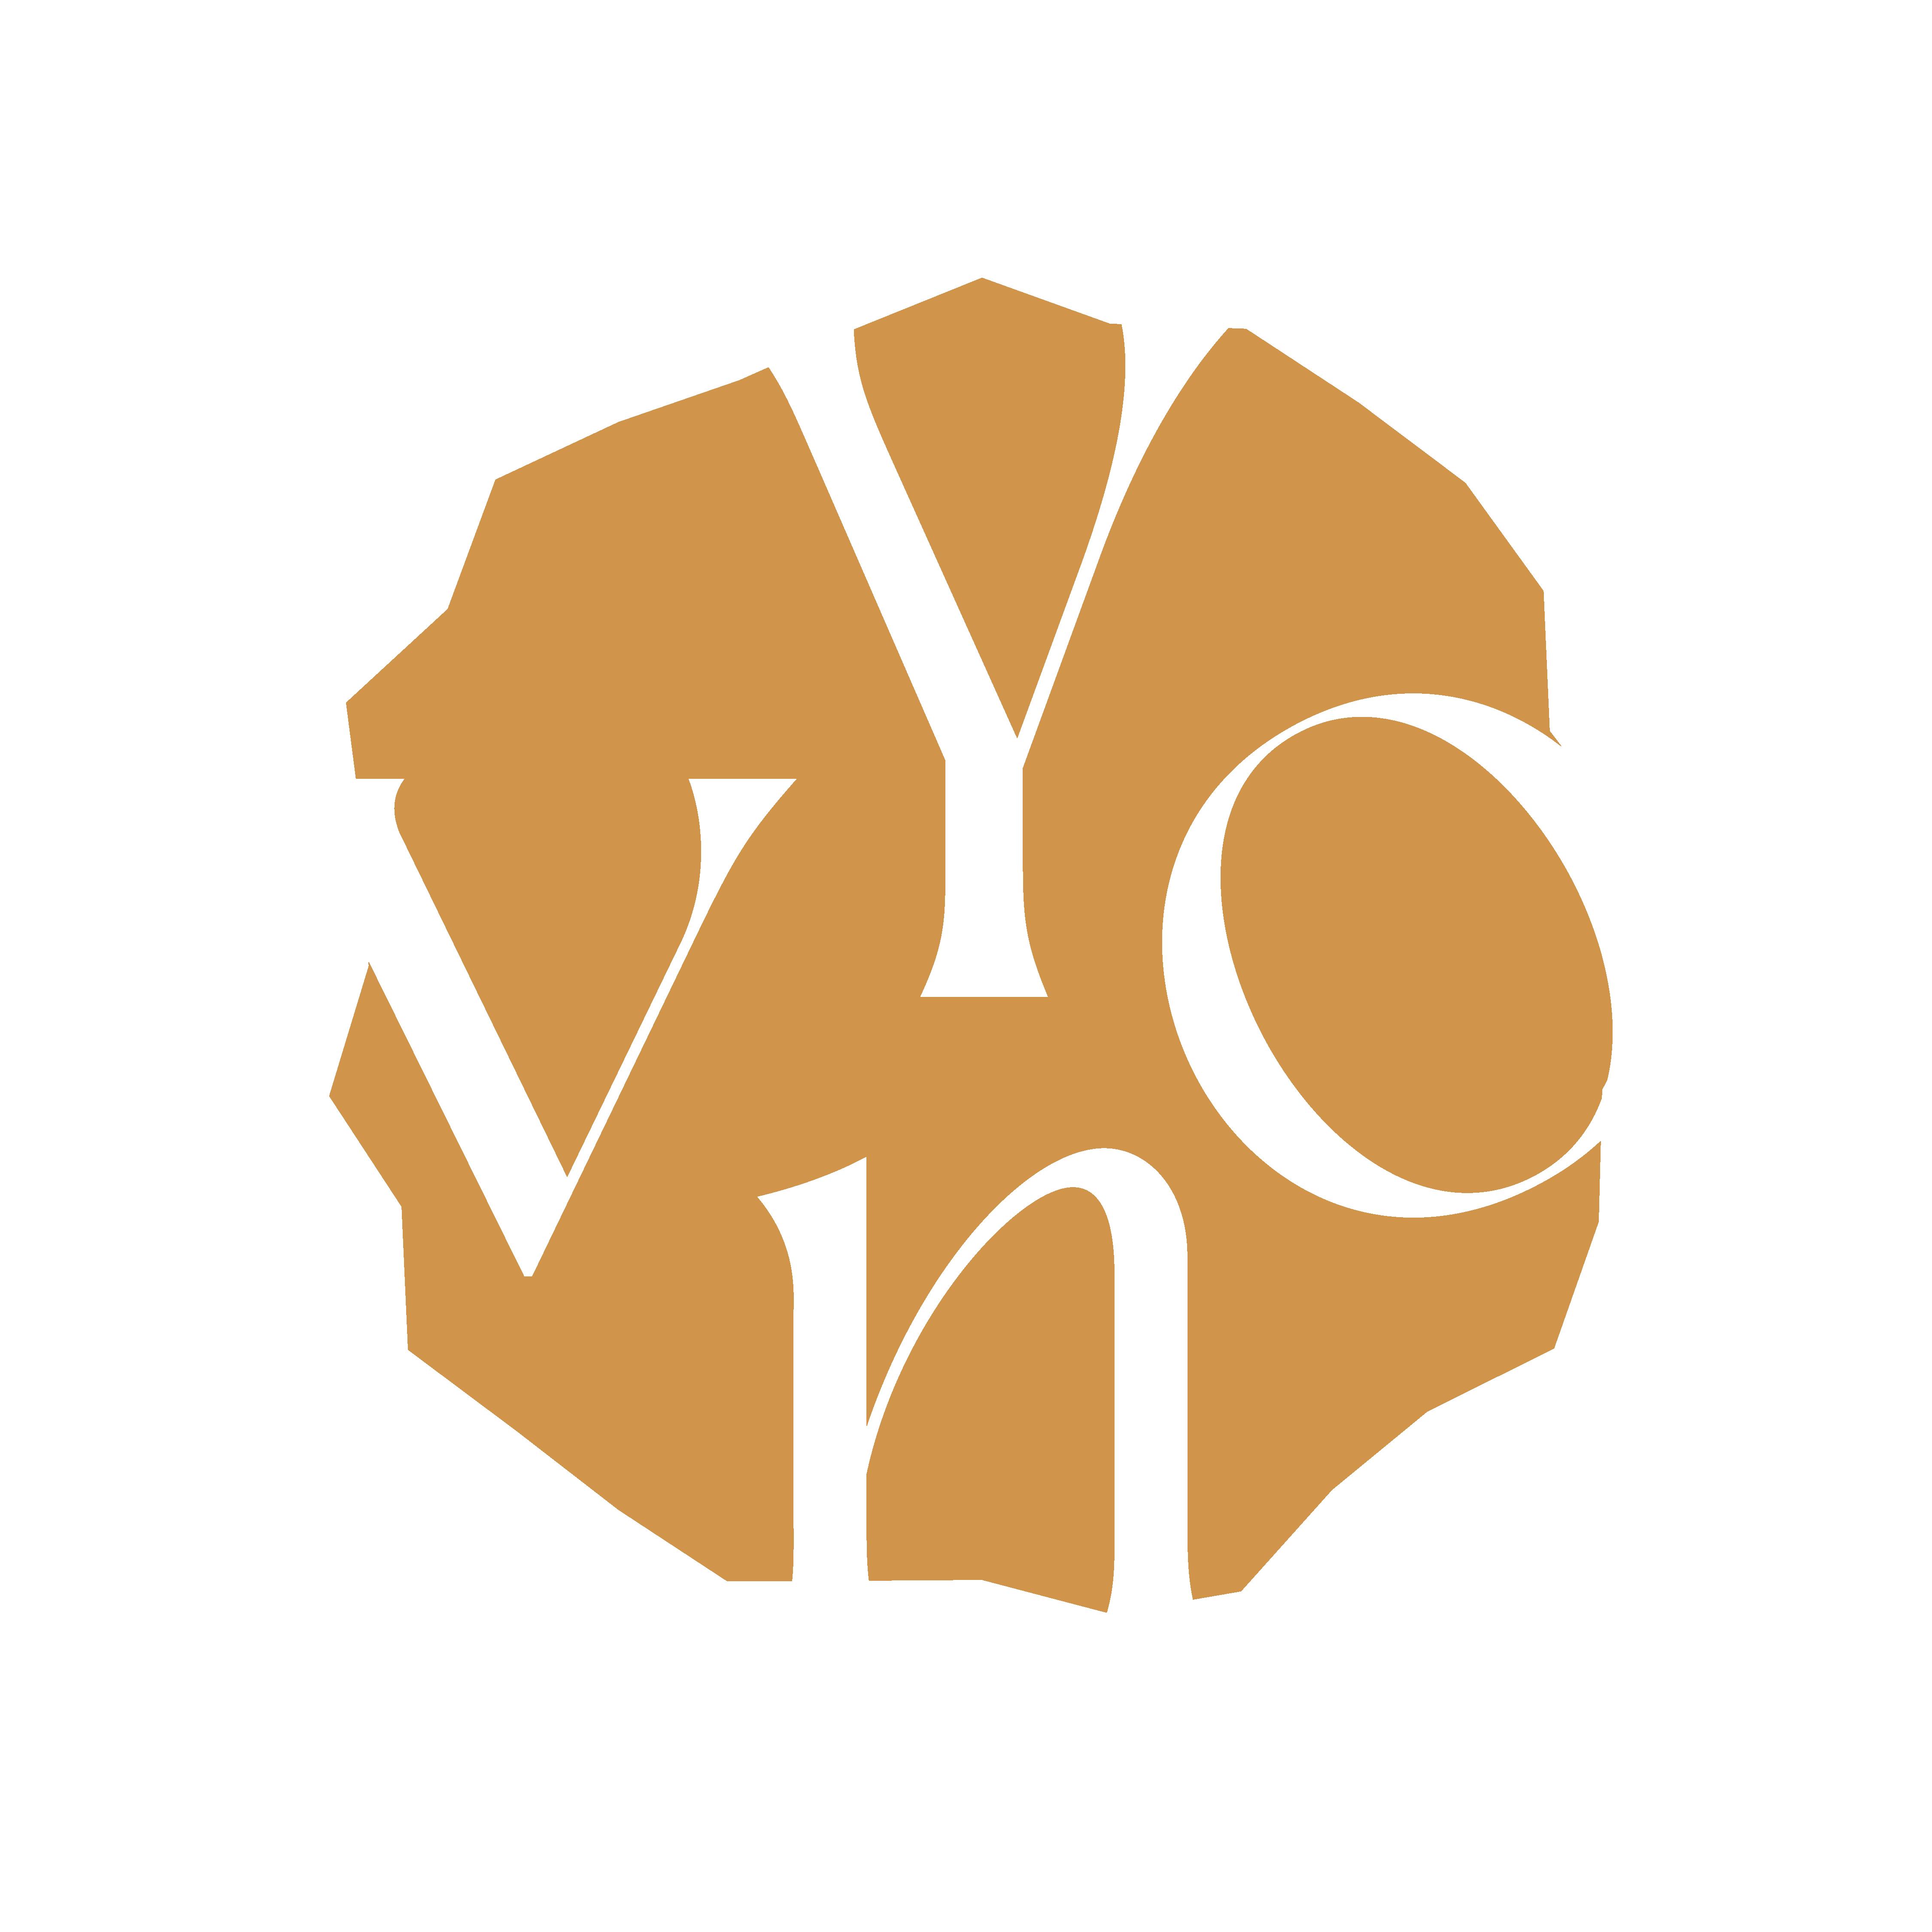 Logo Yvon van Bergen organic shape